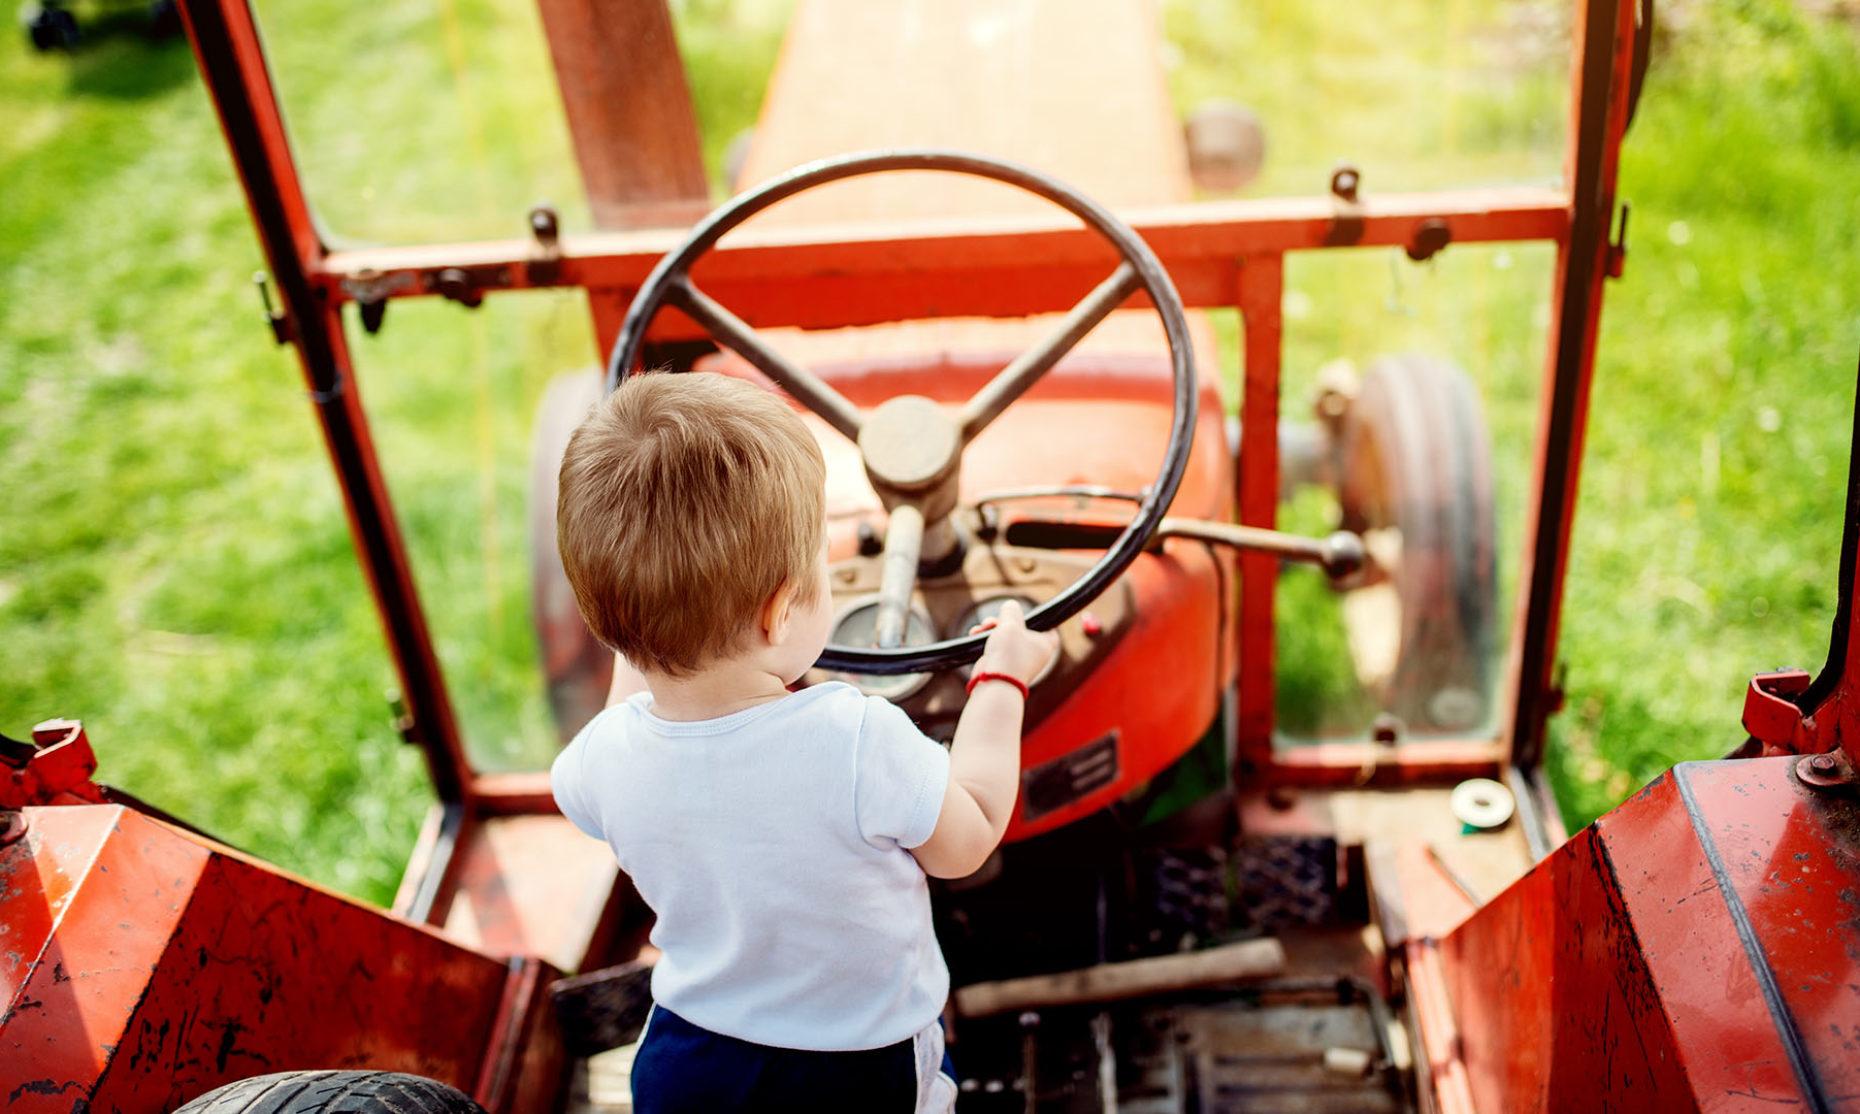 Nachfolgeregelung_KMU_Kind_Traktor